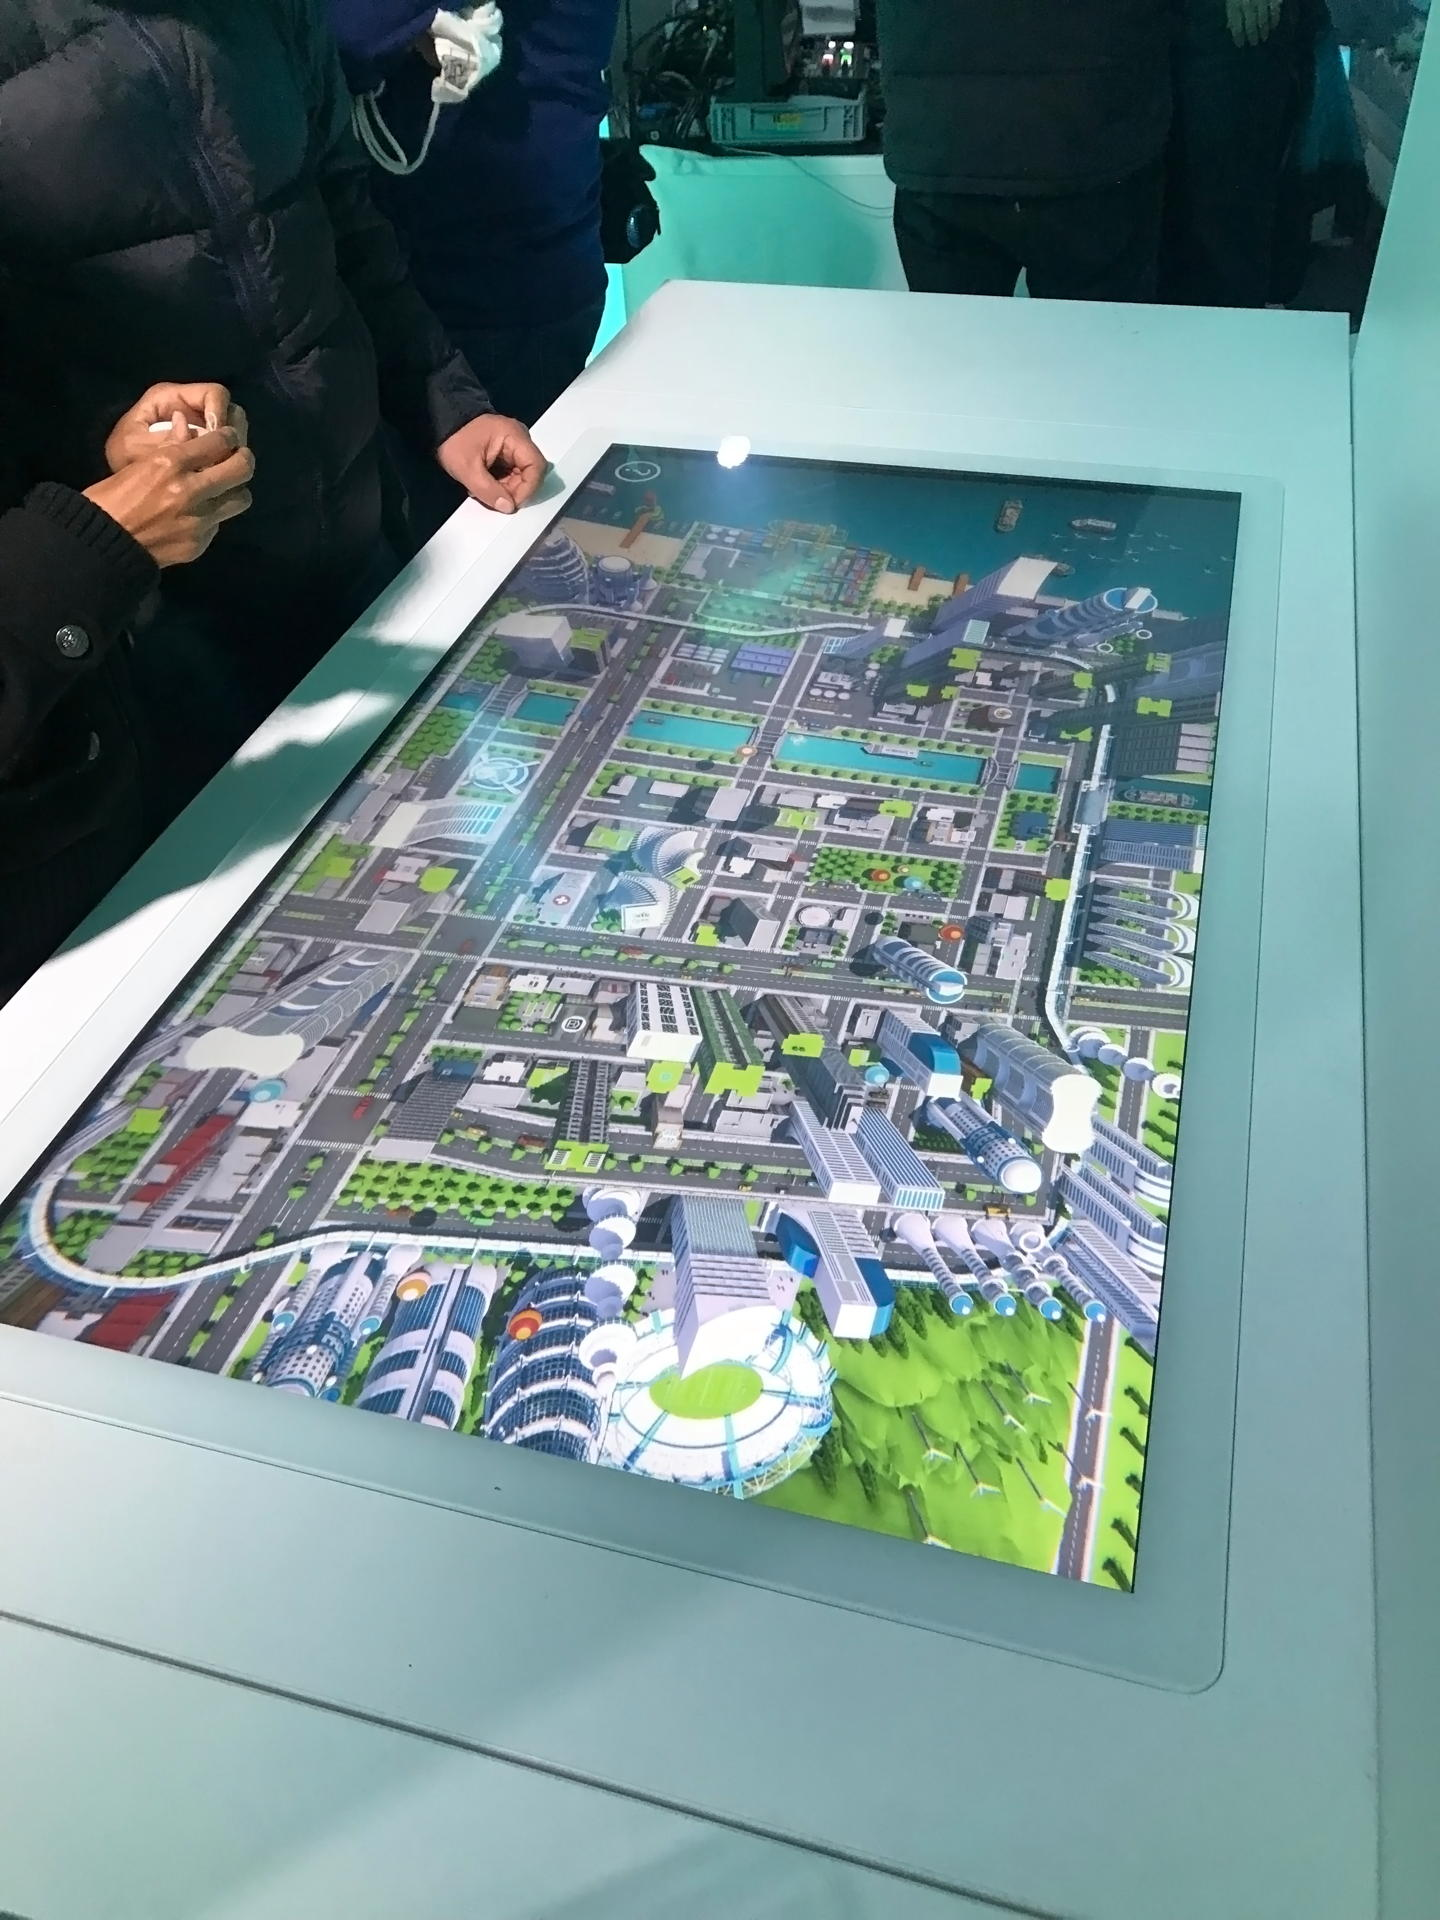 Stadt_der_Zukunft_pong_li_2